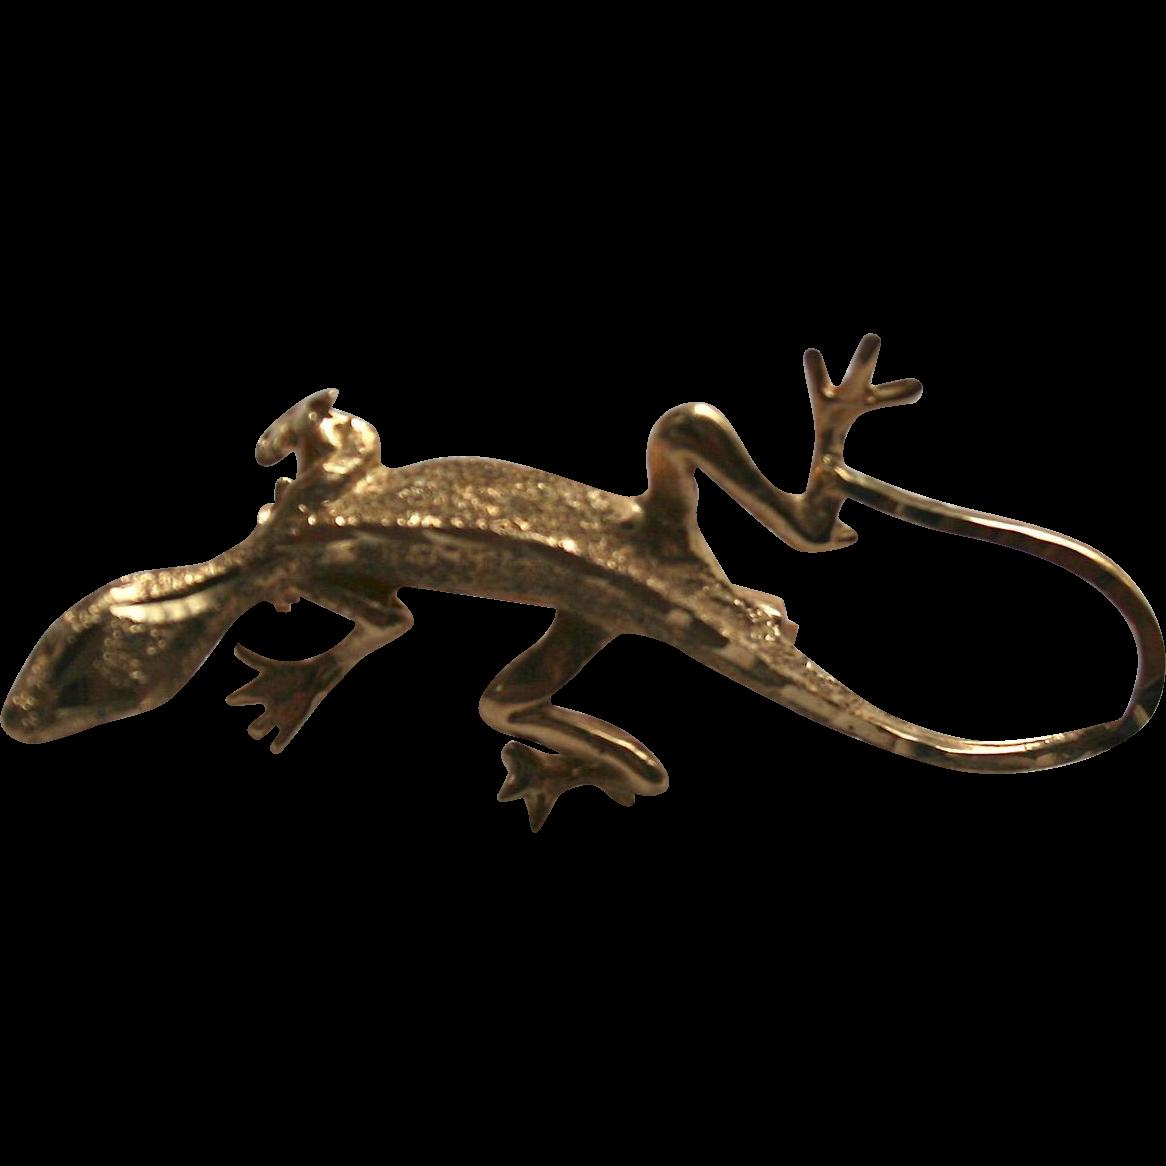 14k Lizard Gecko Salamander Solid Gold Brooch Pin From Randomharvest On Ruby Lane